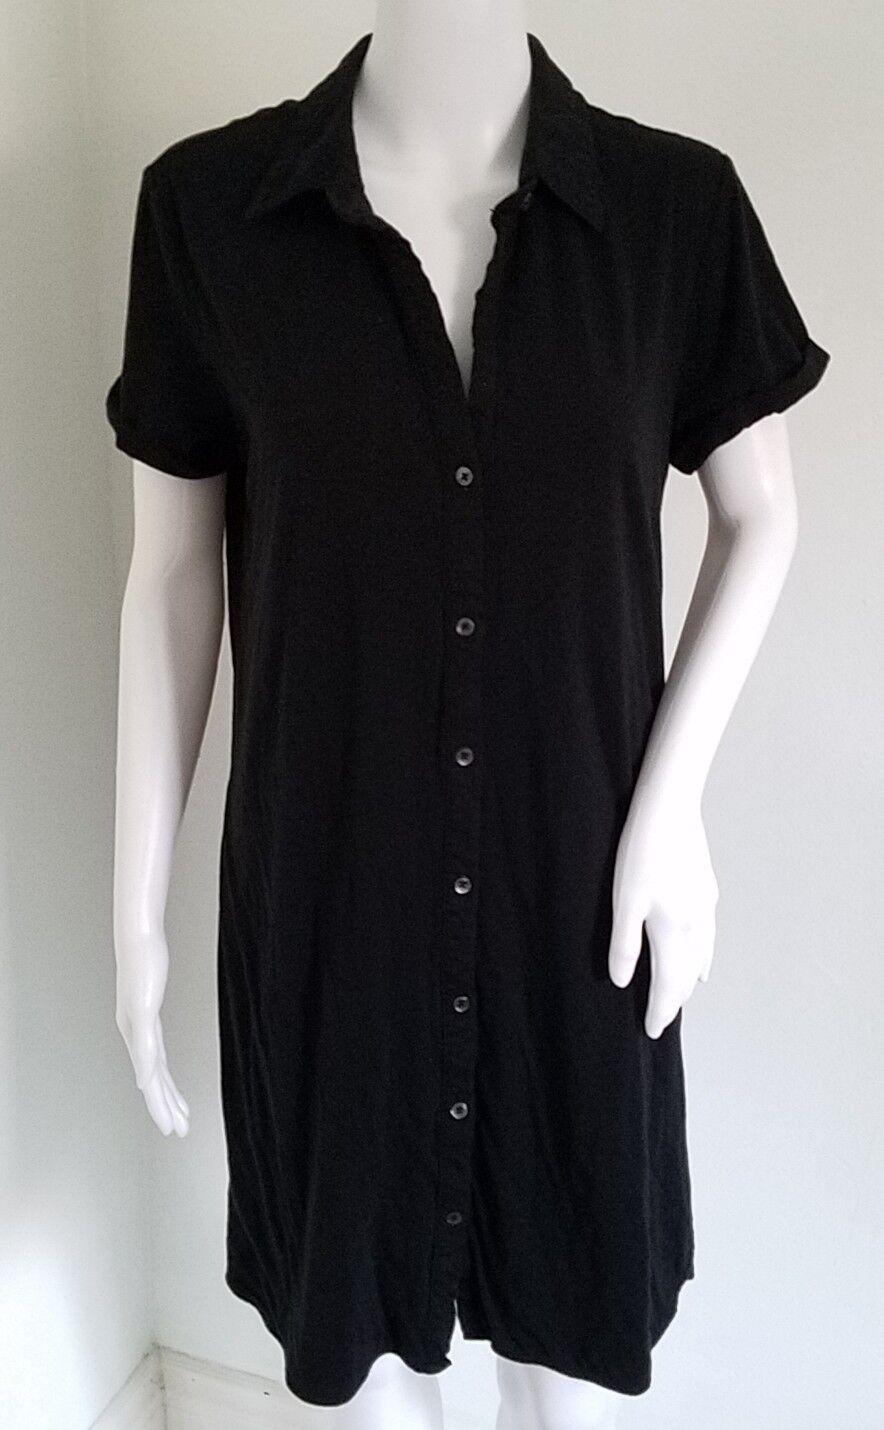 Standard James Perse schwarz Jersey Knit Tunic Button Down Dress damen Größe 3